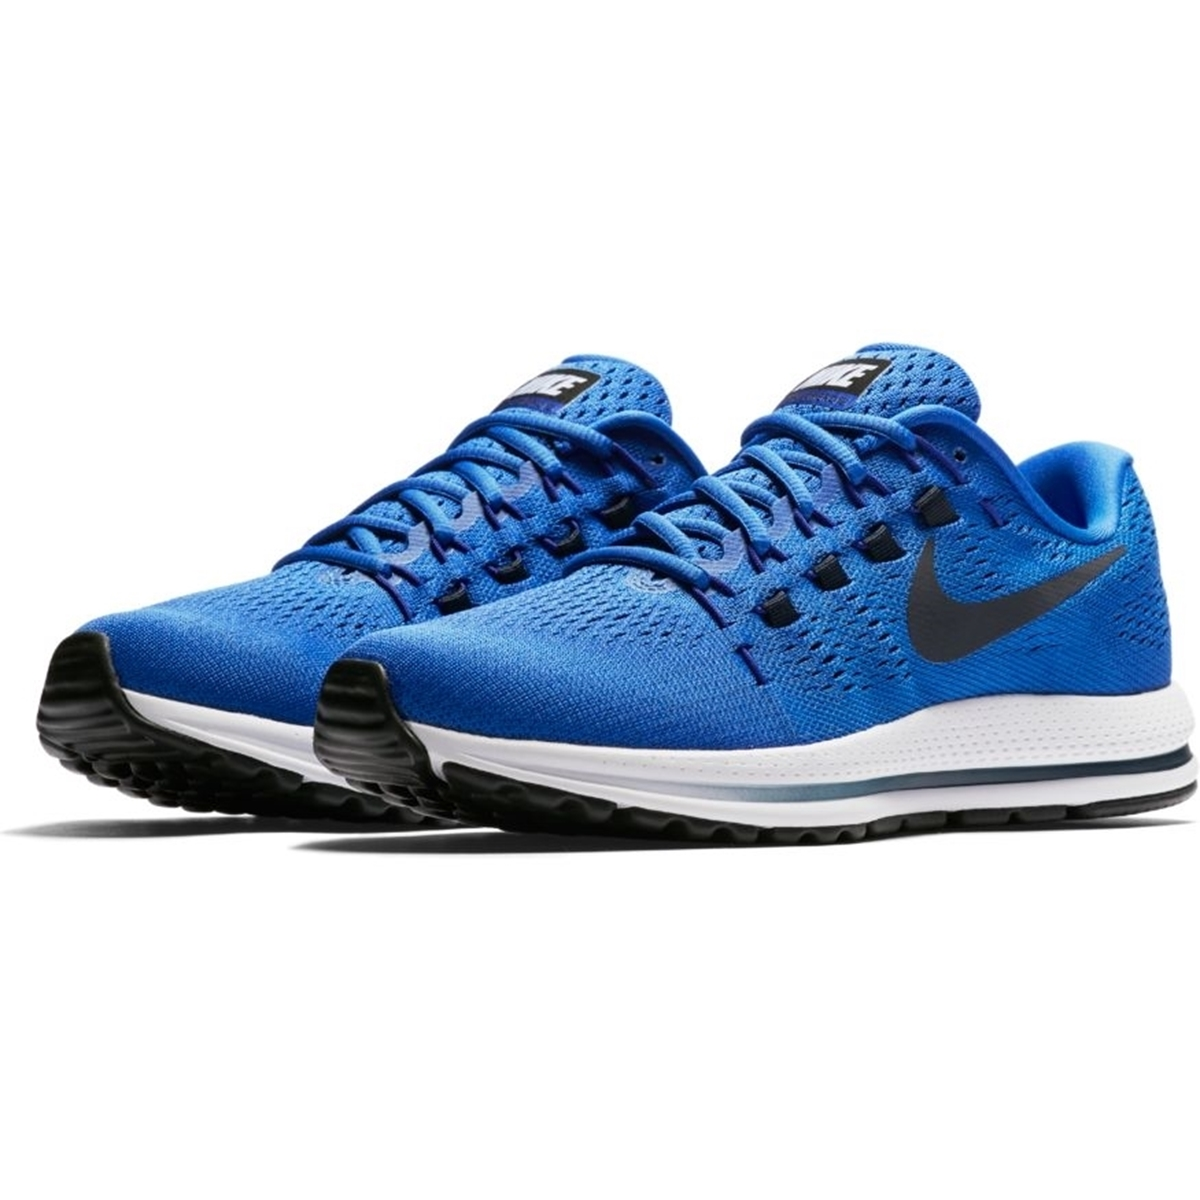 best service 6952e a45f3 Bilde av Nike NIKE AIR ZOOM VOMERO 12 863762-407